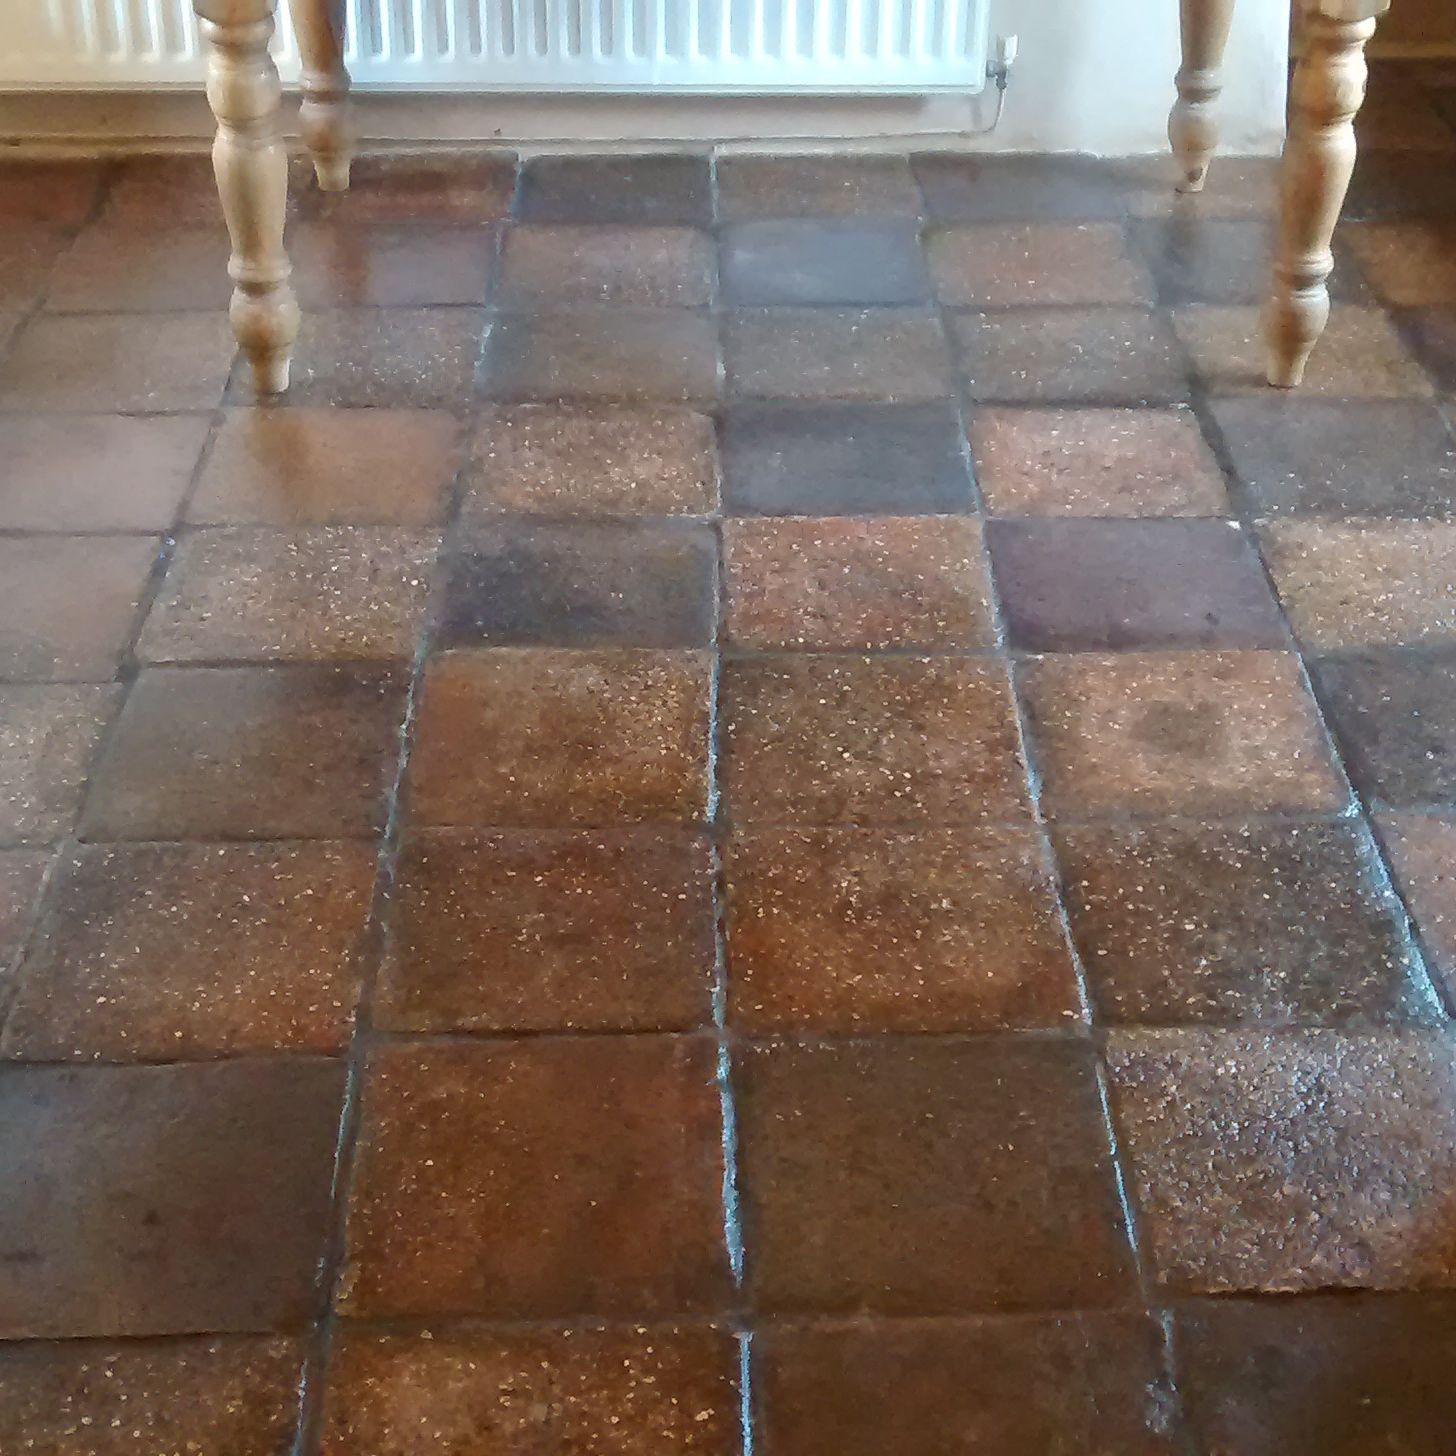 Inspirational quarry tiles kitchen taste restored belfast quarry tiled kitchen floor the patio dailygadgetfo Images